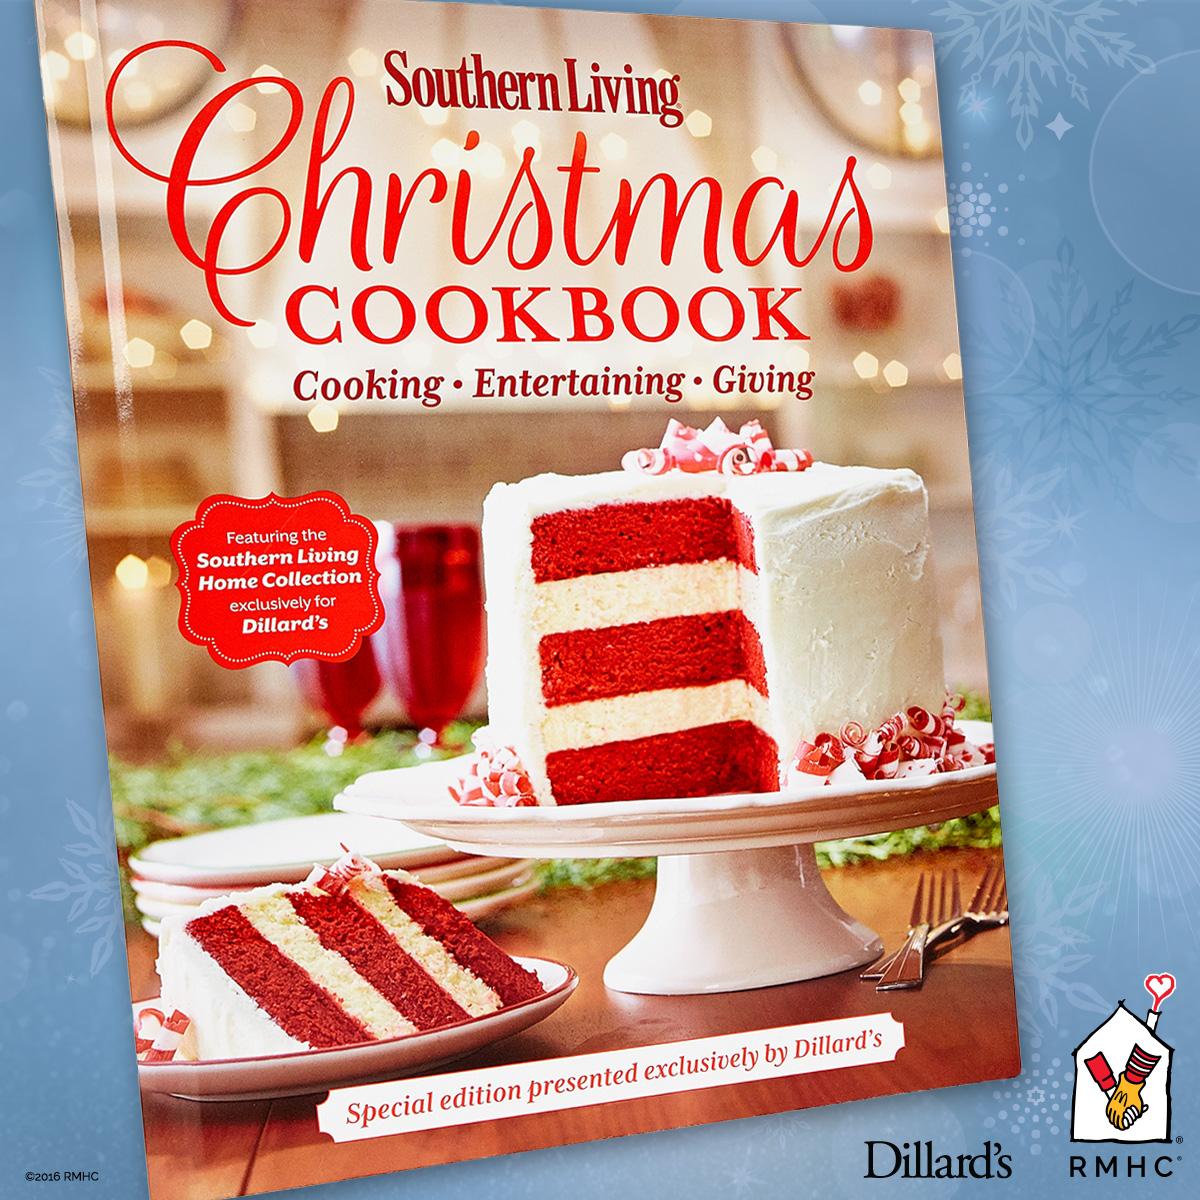 Southern Living 2021 Southern Living® Christmas Cookbook Dillard S Southern Living Cookbook Ronald Mcdonald House Charities Of Alabama